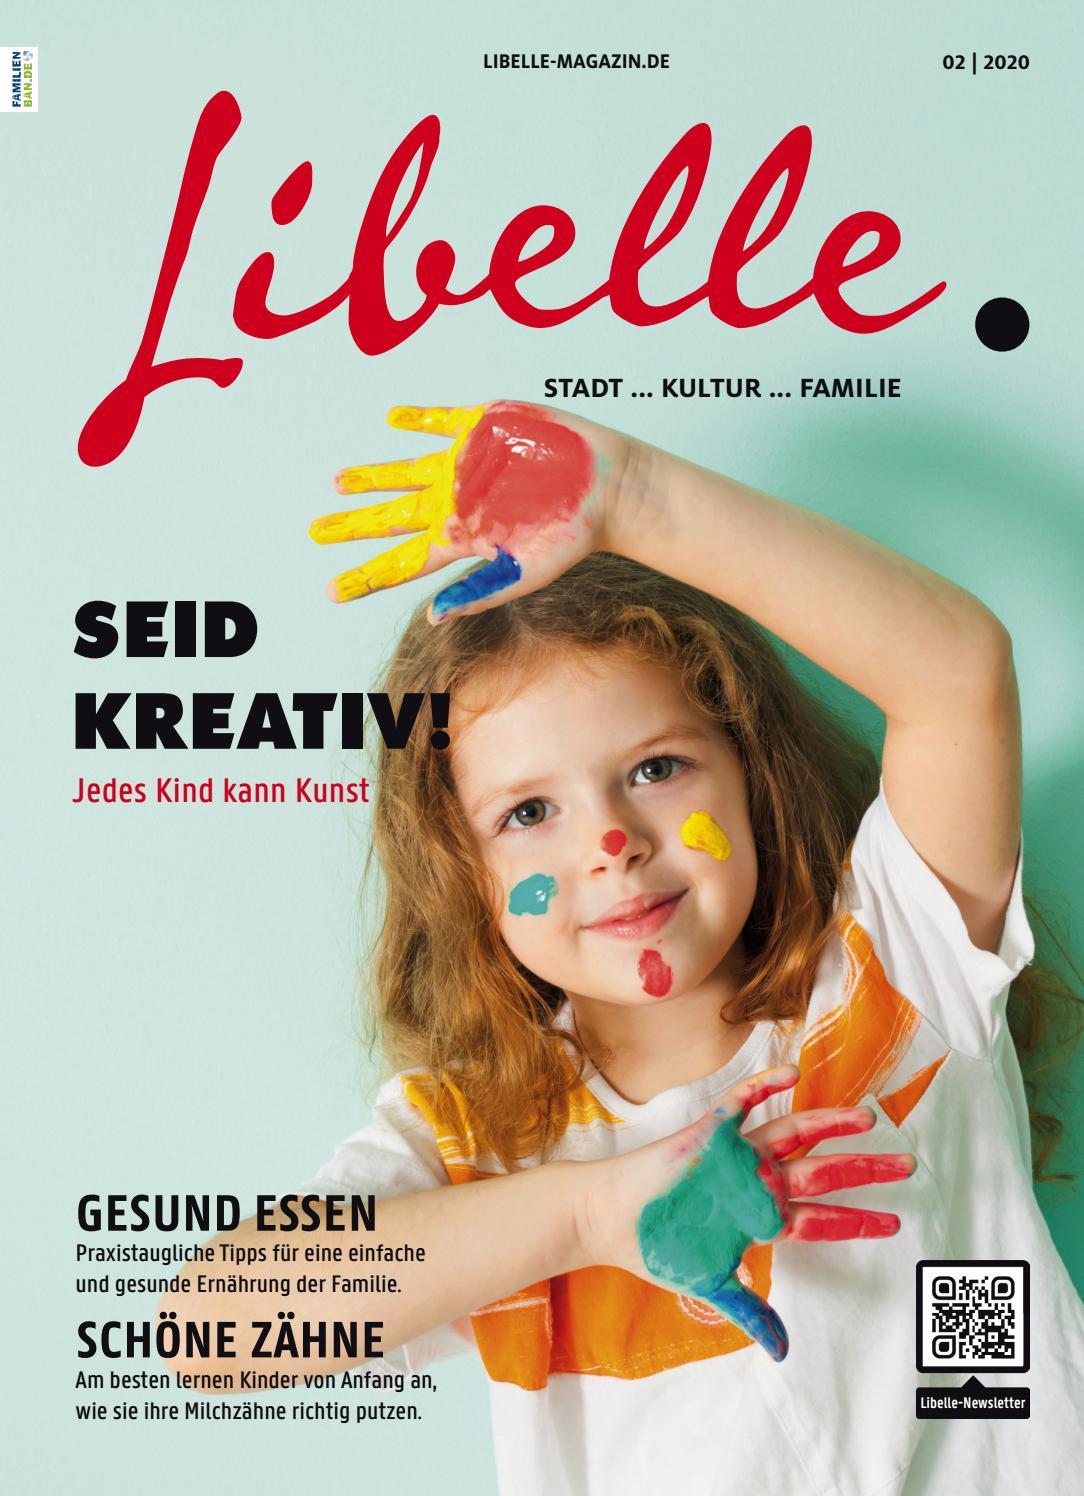 Libelle Februar 15 by Libelle   Stadt ... Kultur ... Familie   issuu